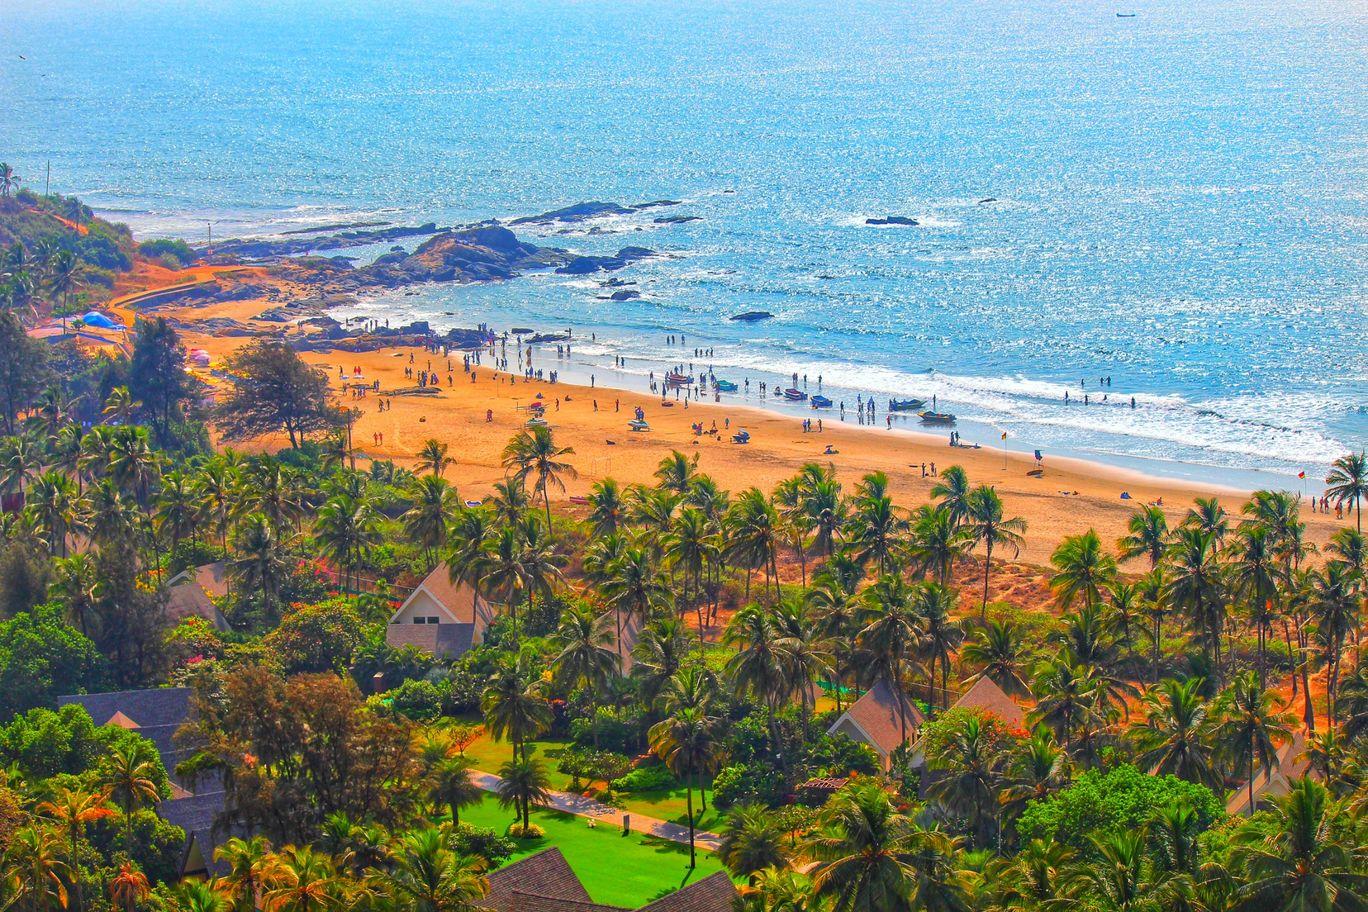 Photo of Vagator Beach By Lalit Teshwar